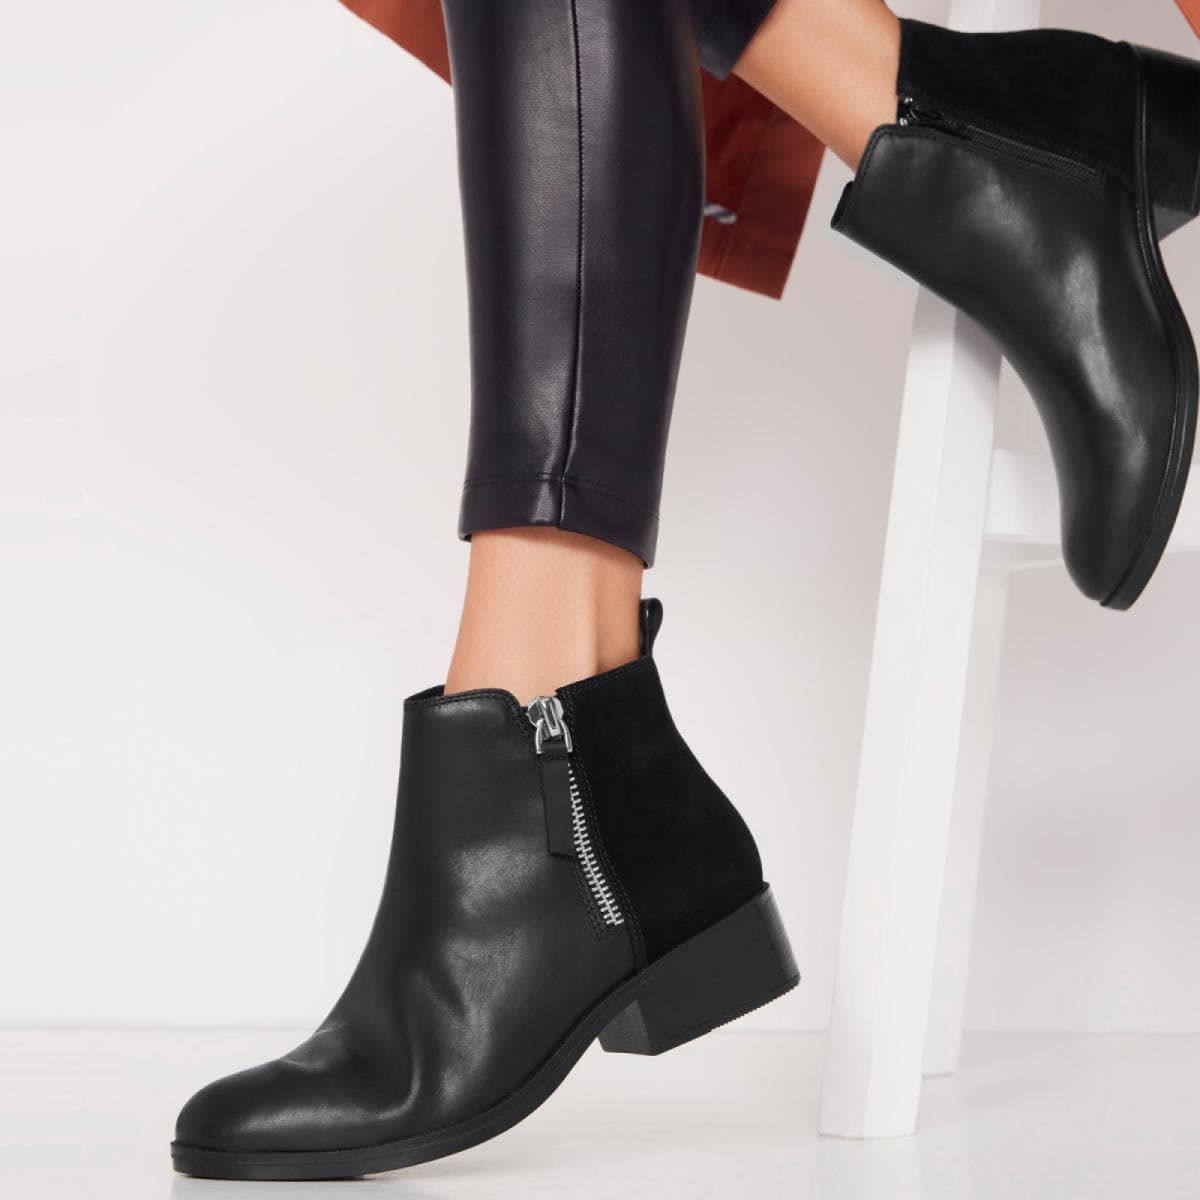 Piliri Black Women's Boots | ALDO US